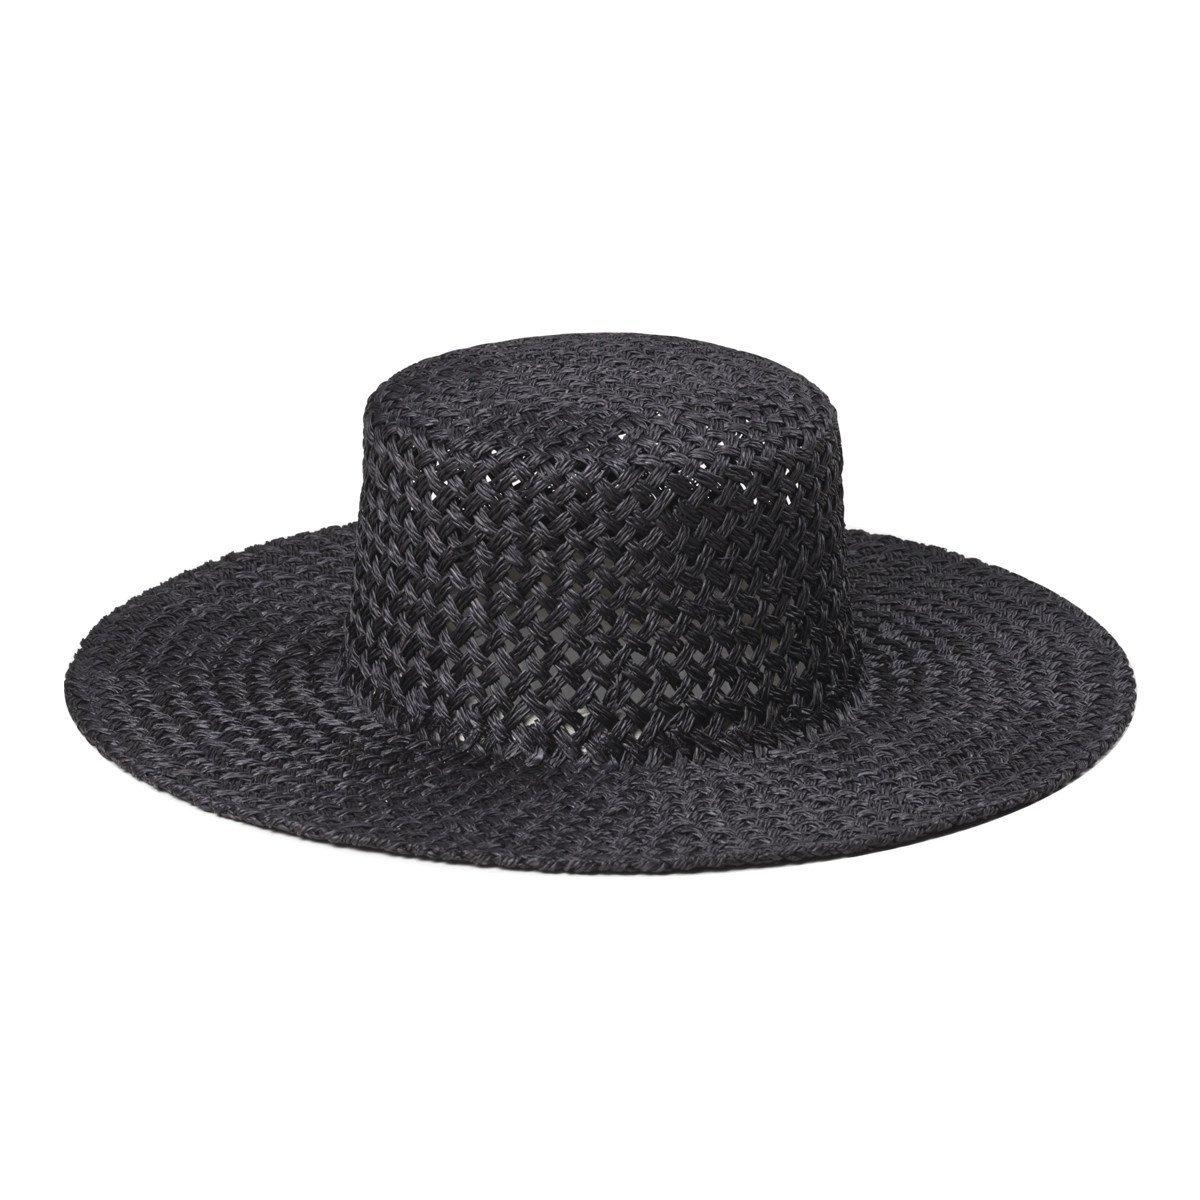 Lack of Color Women's Sunnydip Noir Straw Boater Black MD (57cm)